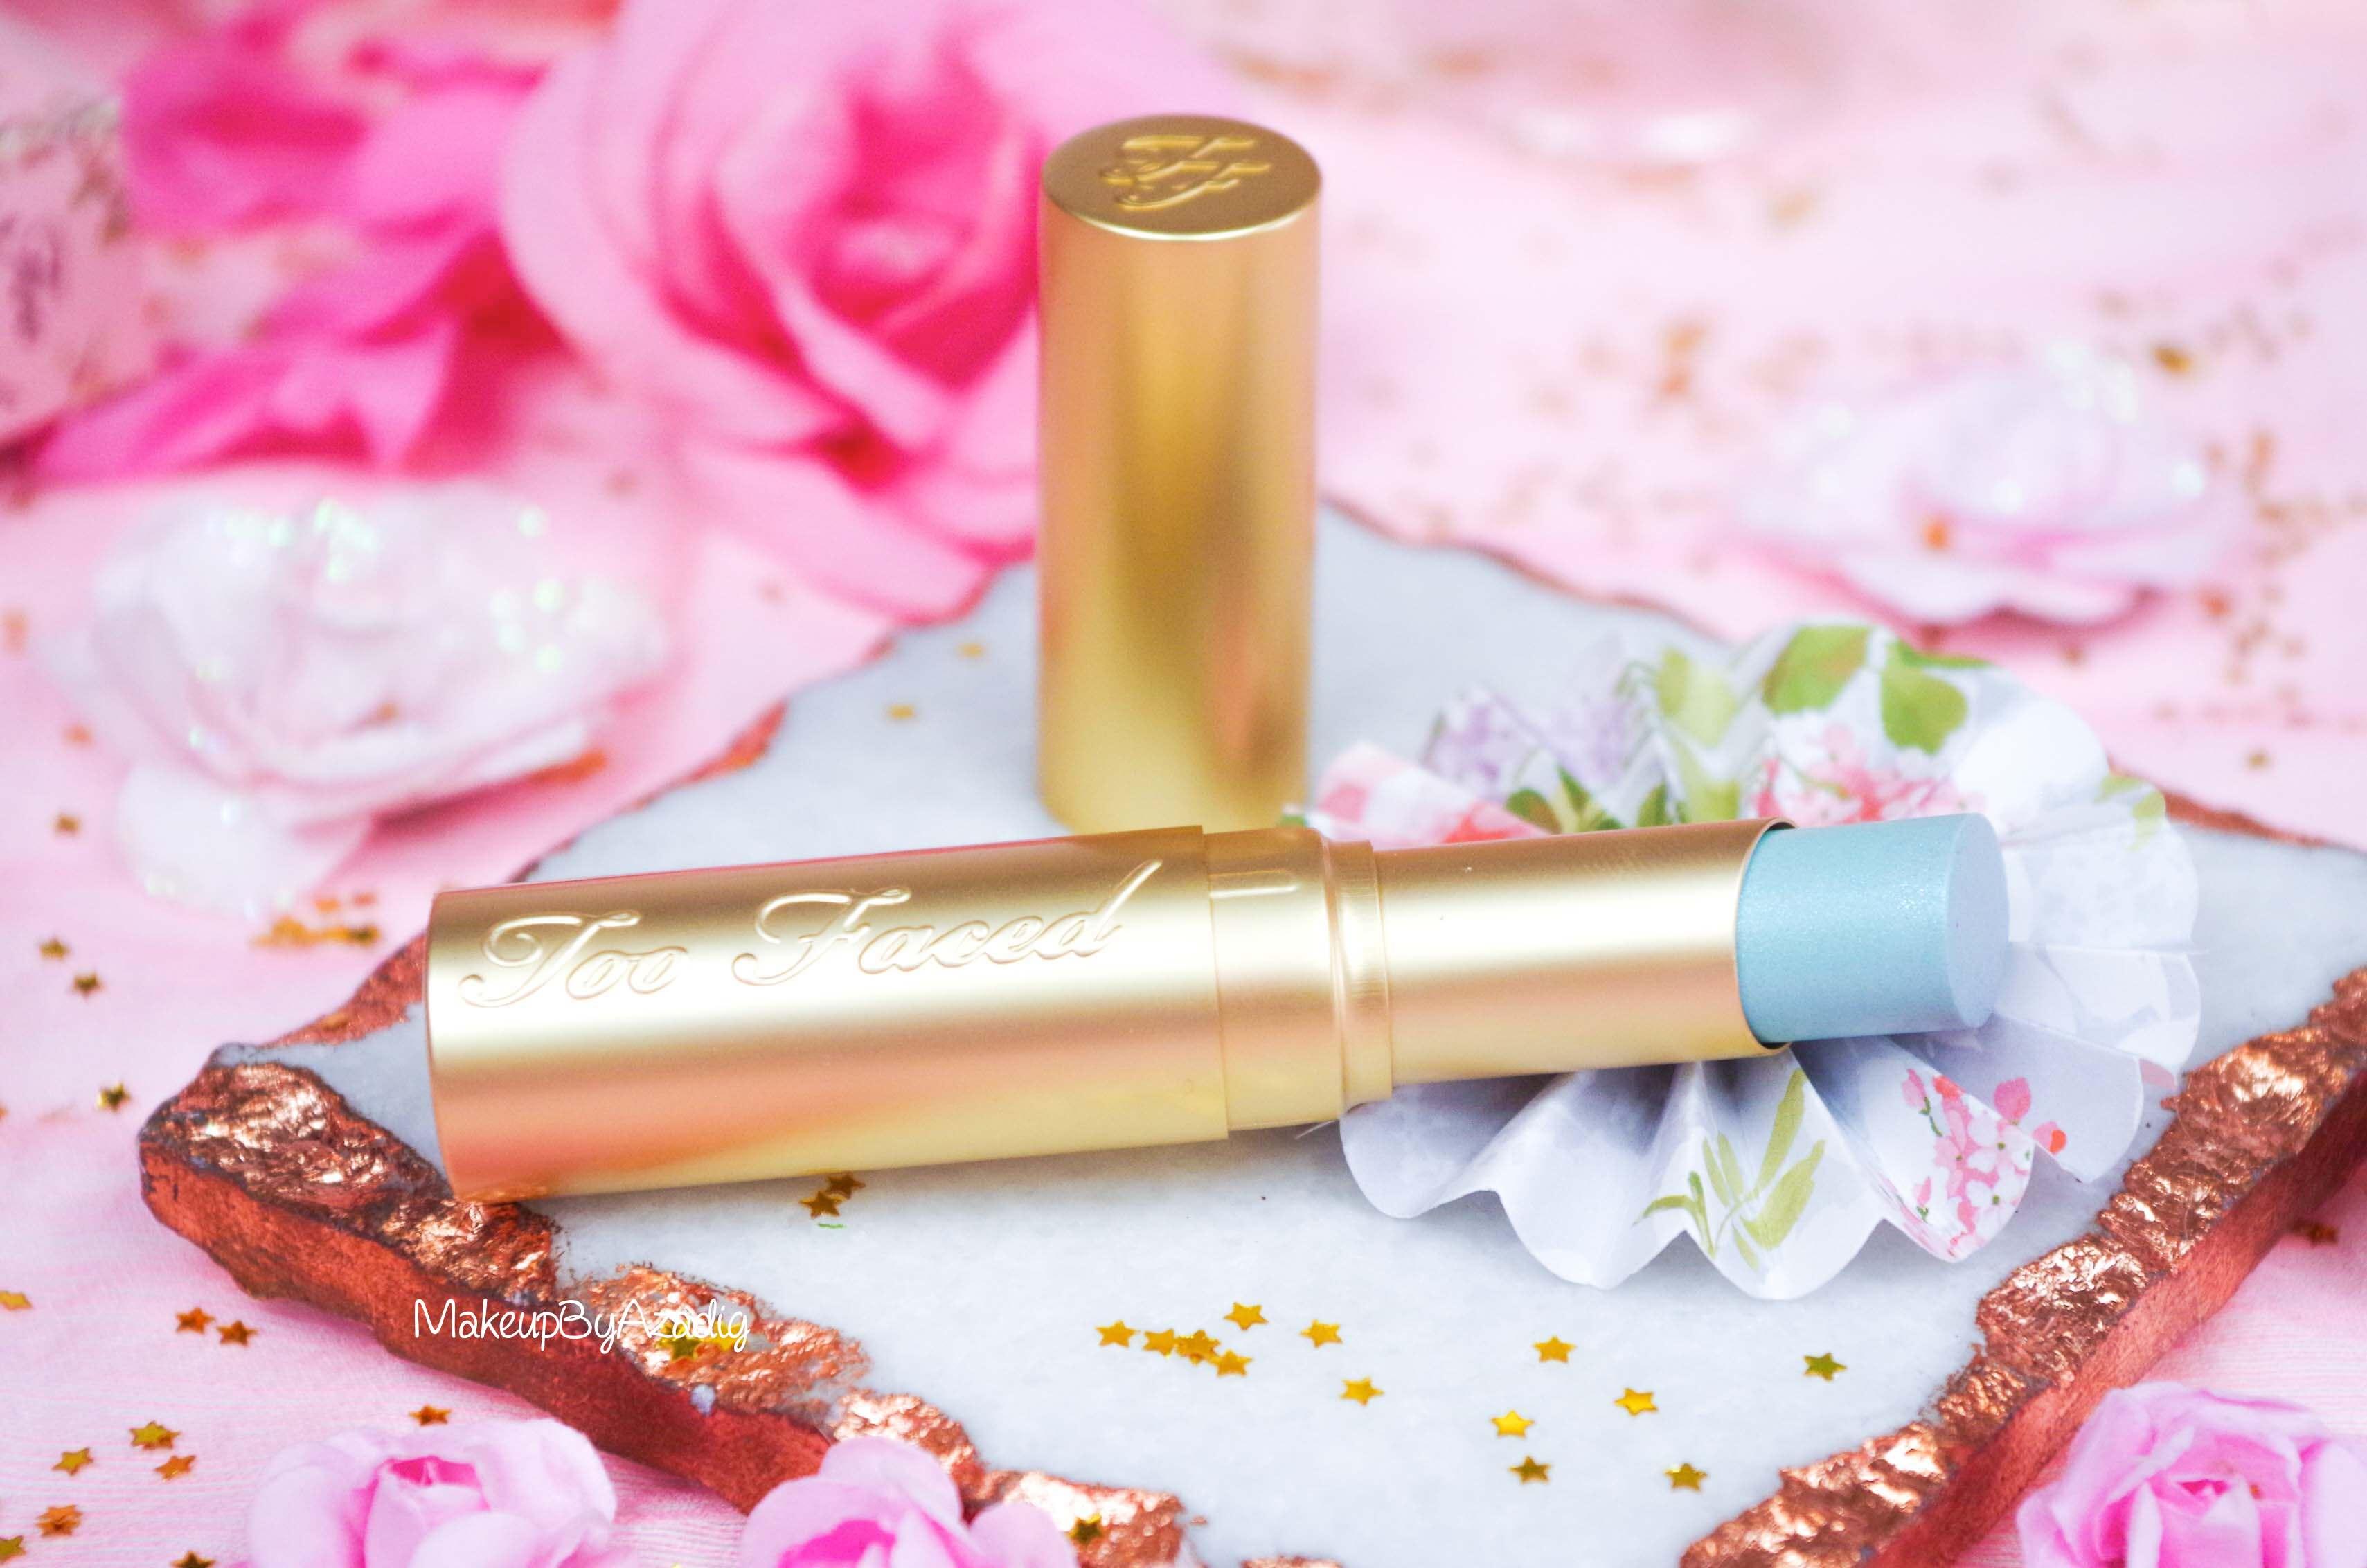 rouge-levres-creme-too-faced-unicorn-tears-magique-makeupbyazadig-swatch-avis-prix-revue-sephora-gold